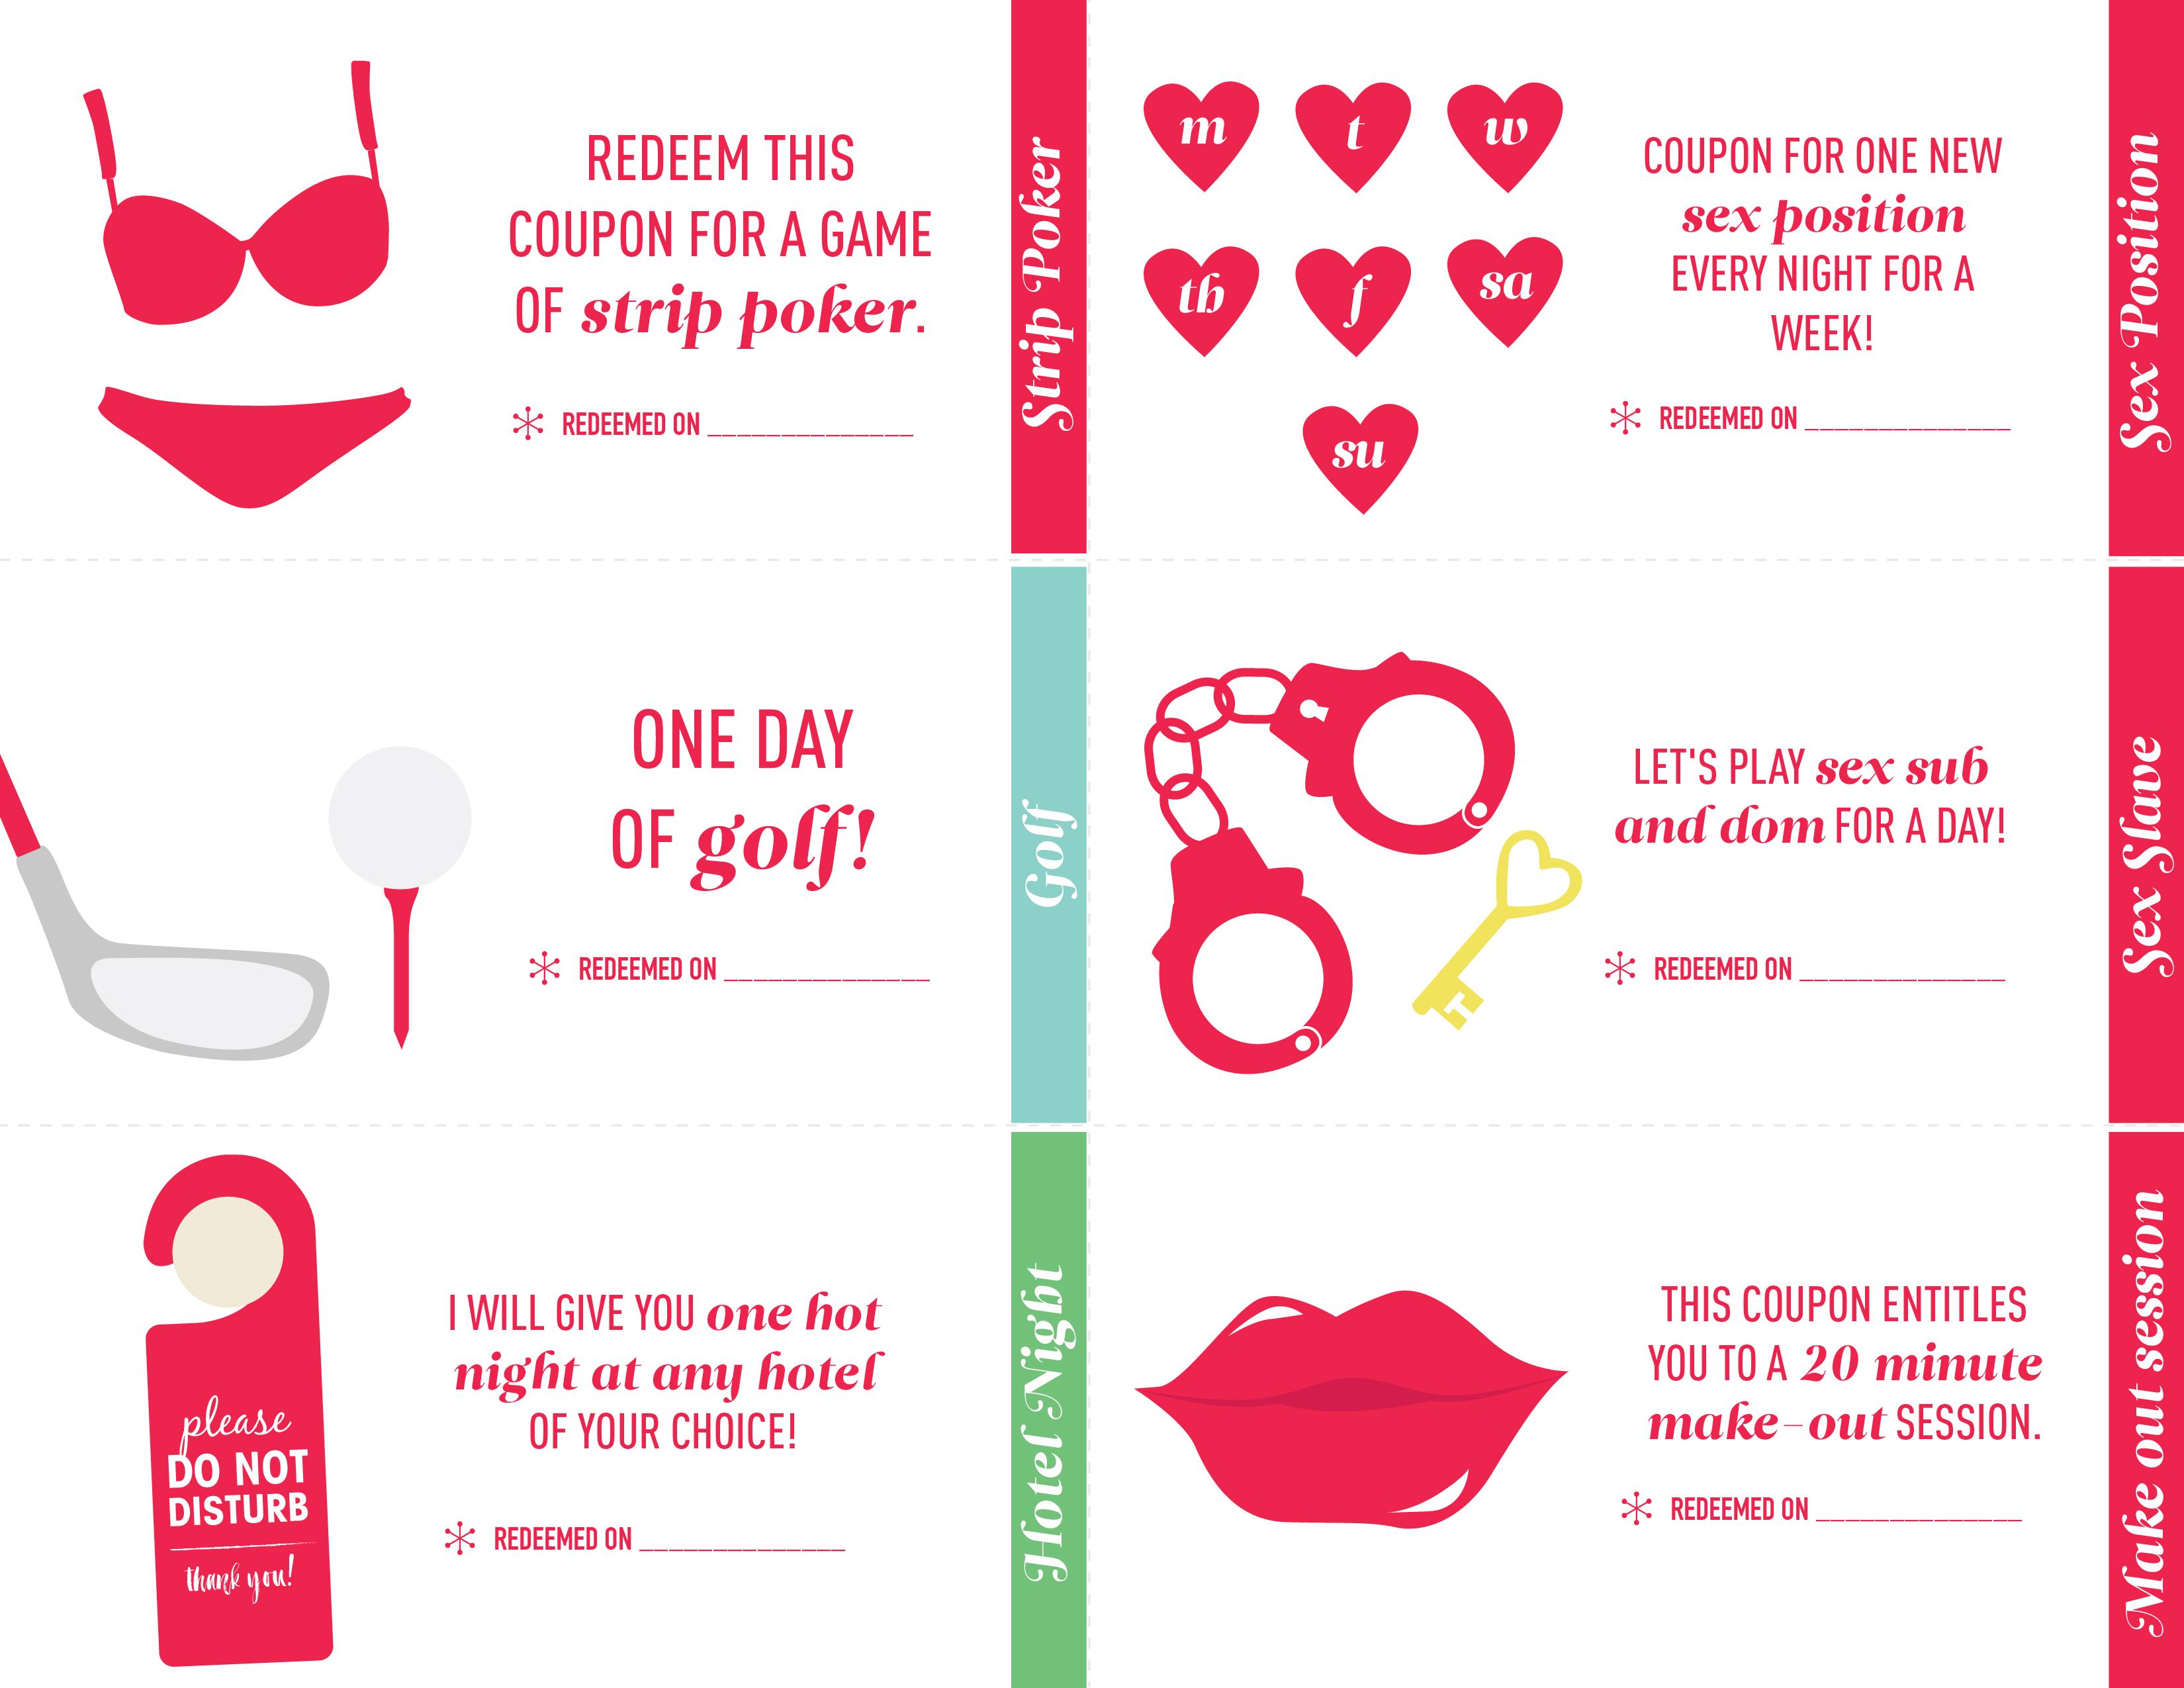 LFM2. CAPÍTULO 51 Love-coupons-book-printable-4